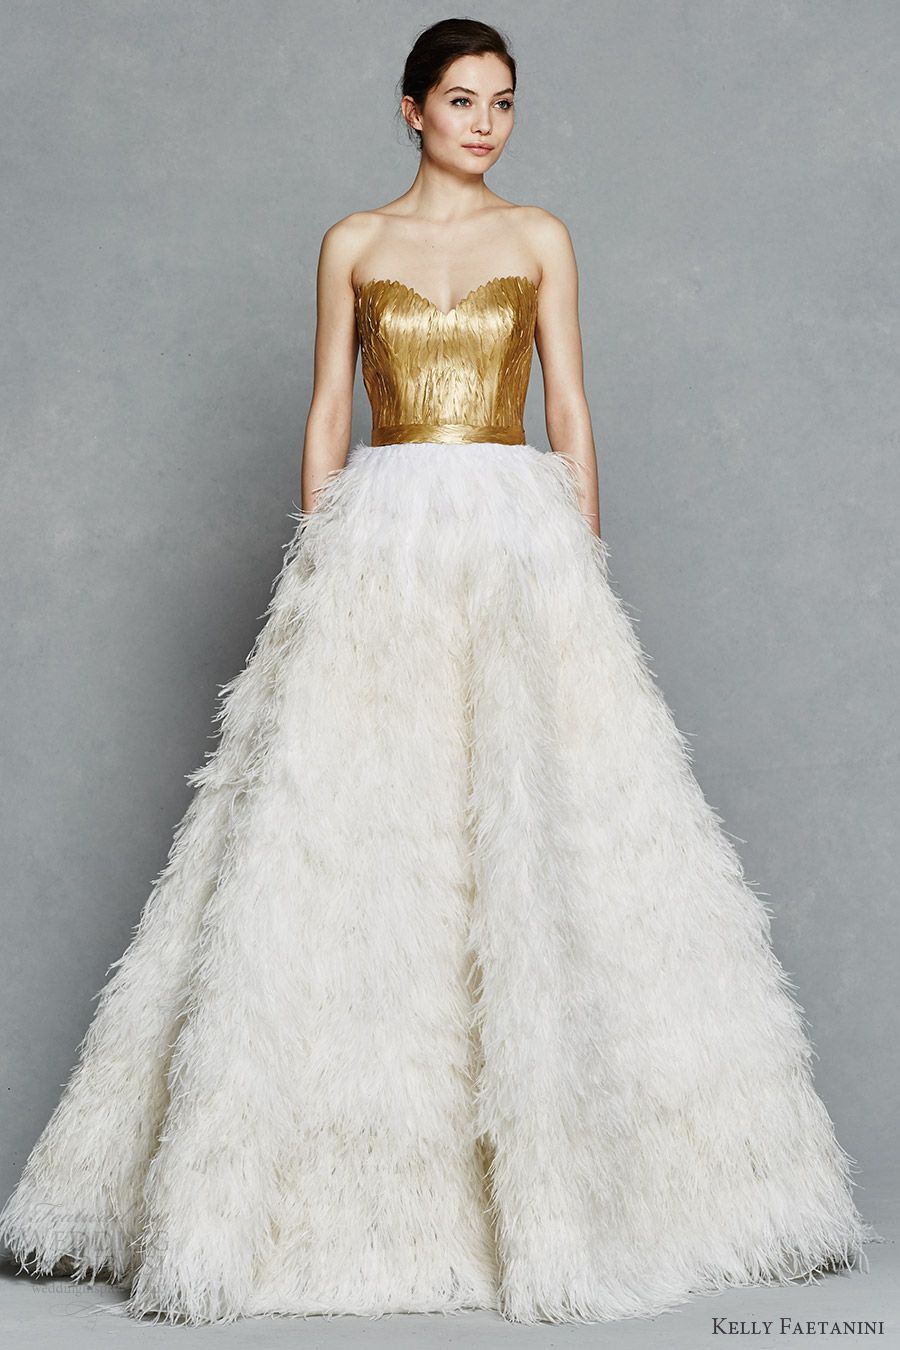 Kelly Faetanini Spring 2017 Wedding Dresses | Painted feathers, Ball ...